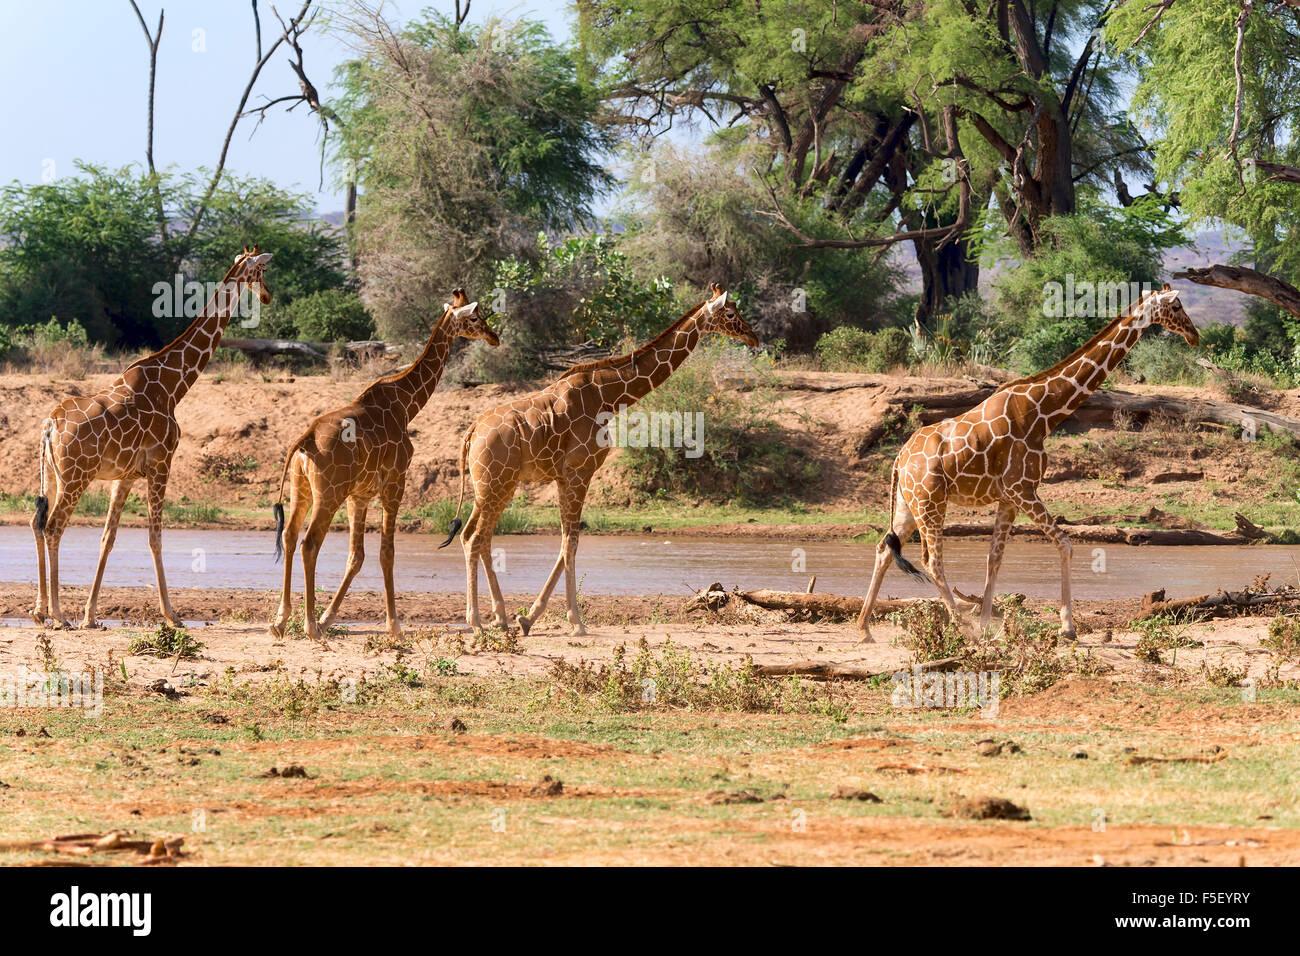 Retikuliert Giraffe oder Somali Giraffen (Giraffa Reticulata Plancius) entlang Fluss, Samburu National Reserve, Kenia Stockfoto